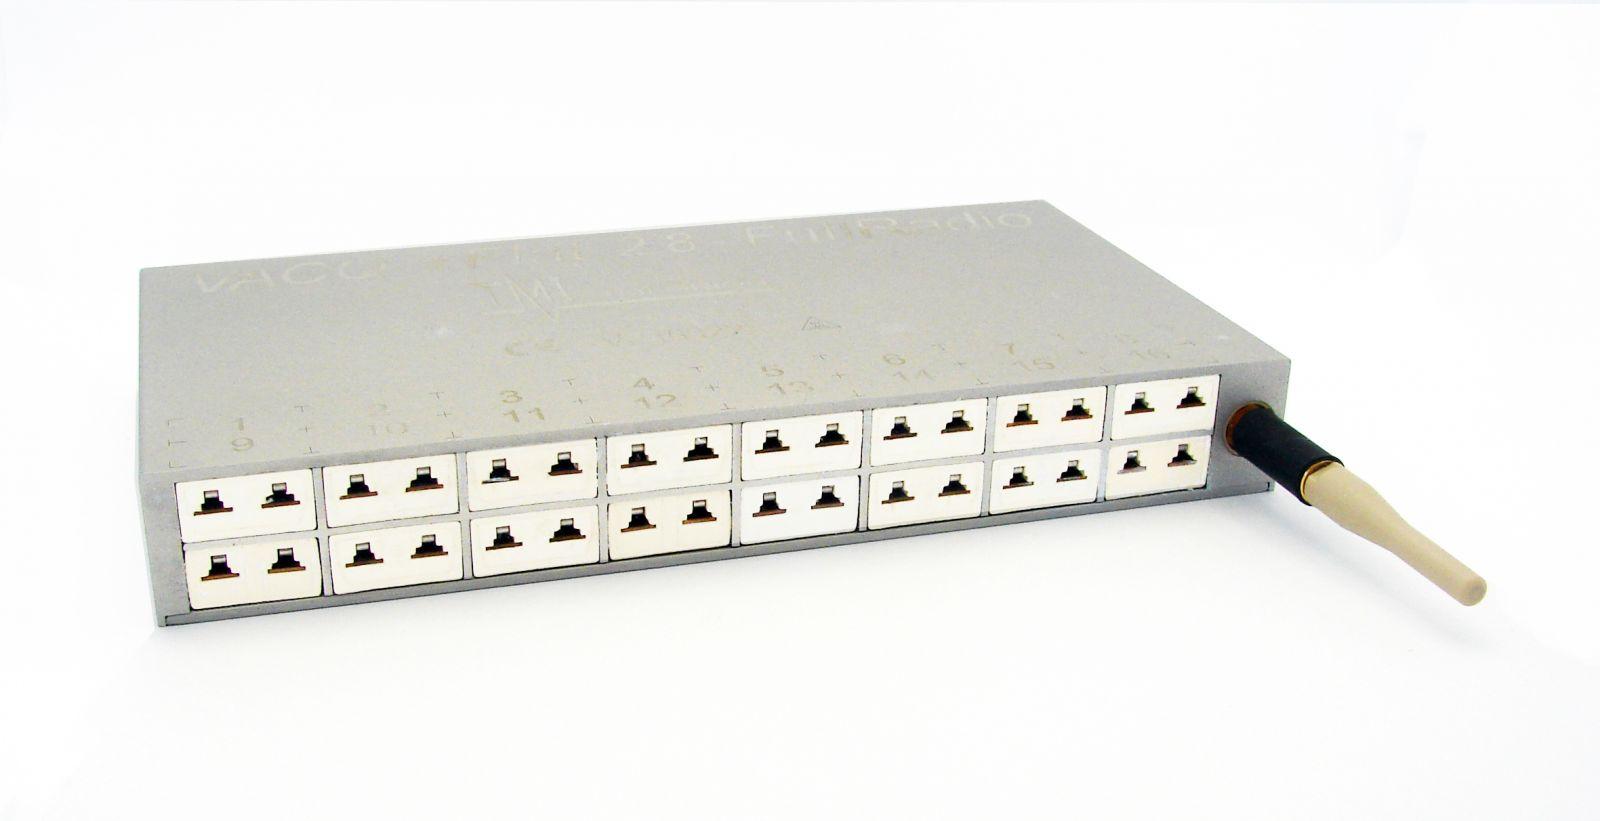 PicoVACQ Th - 3 modèles